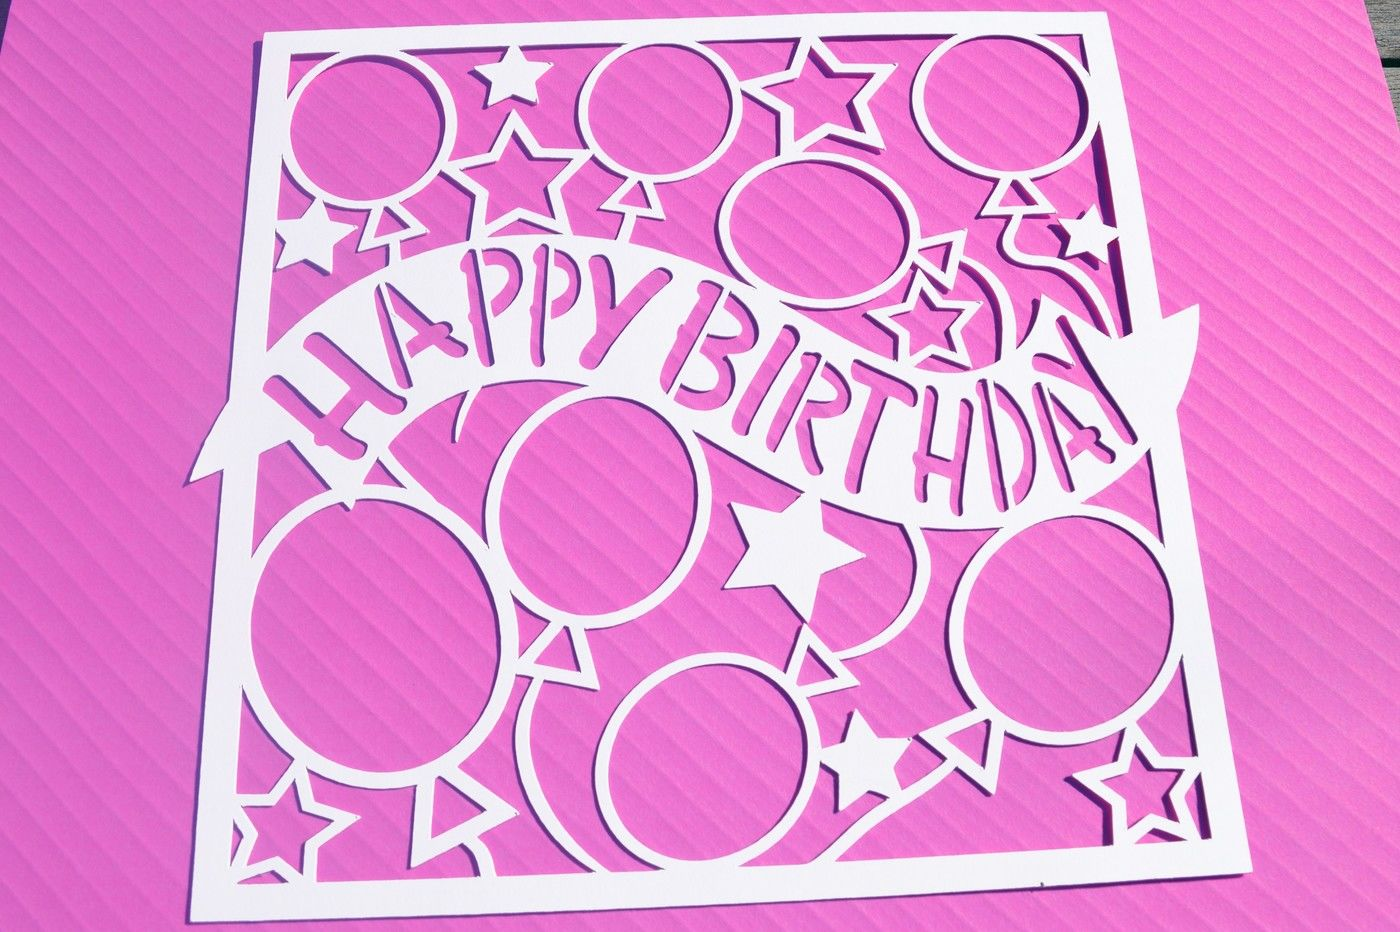 Happy Birthday Svg Dxf Eps Files By Digital Gems